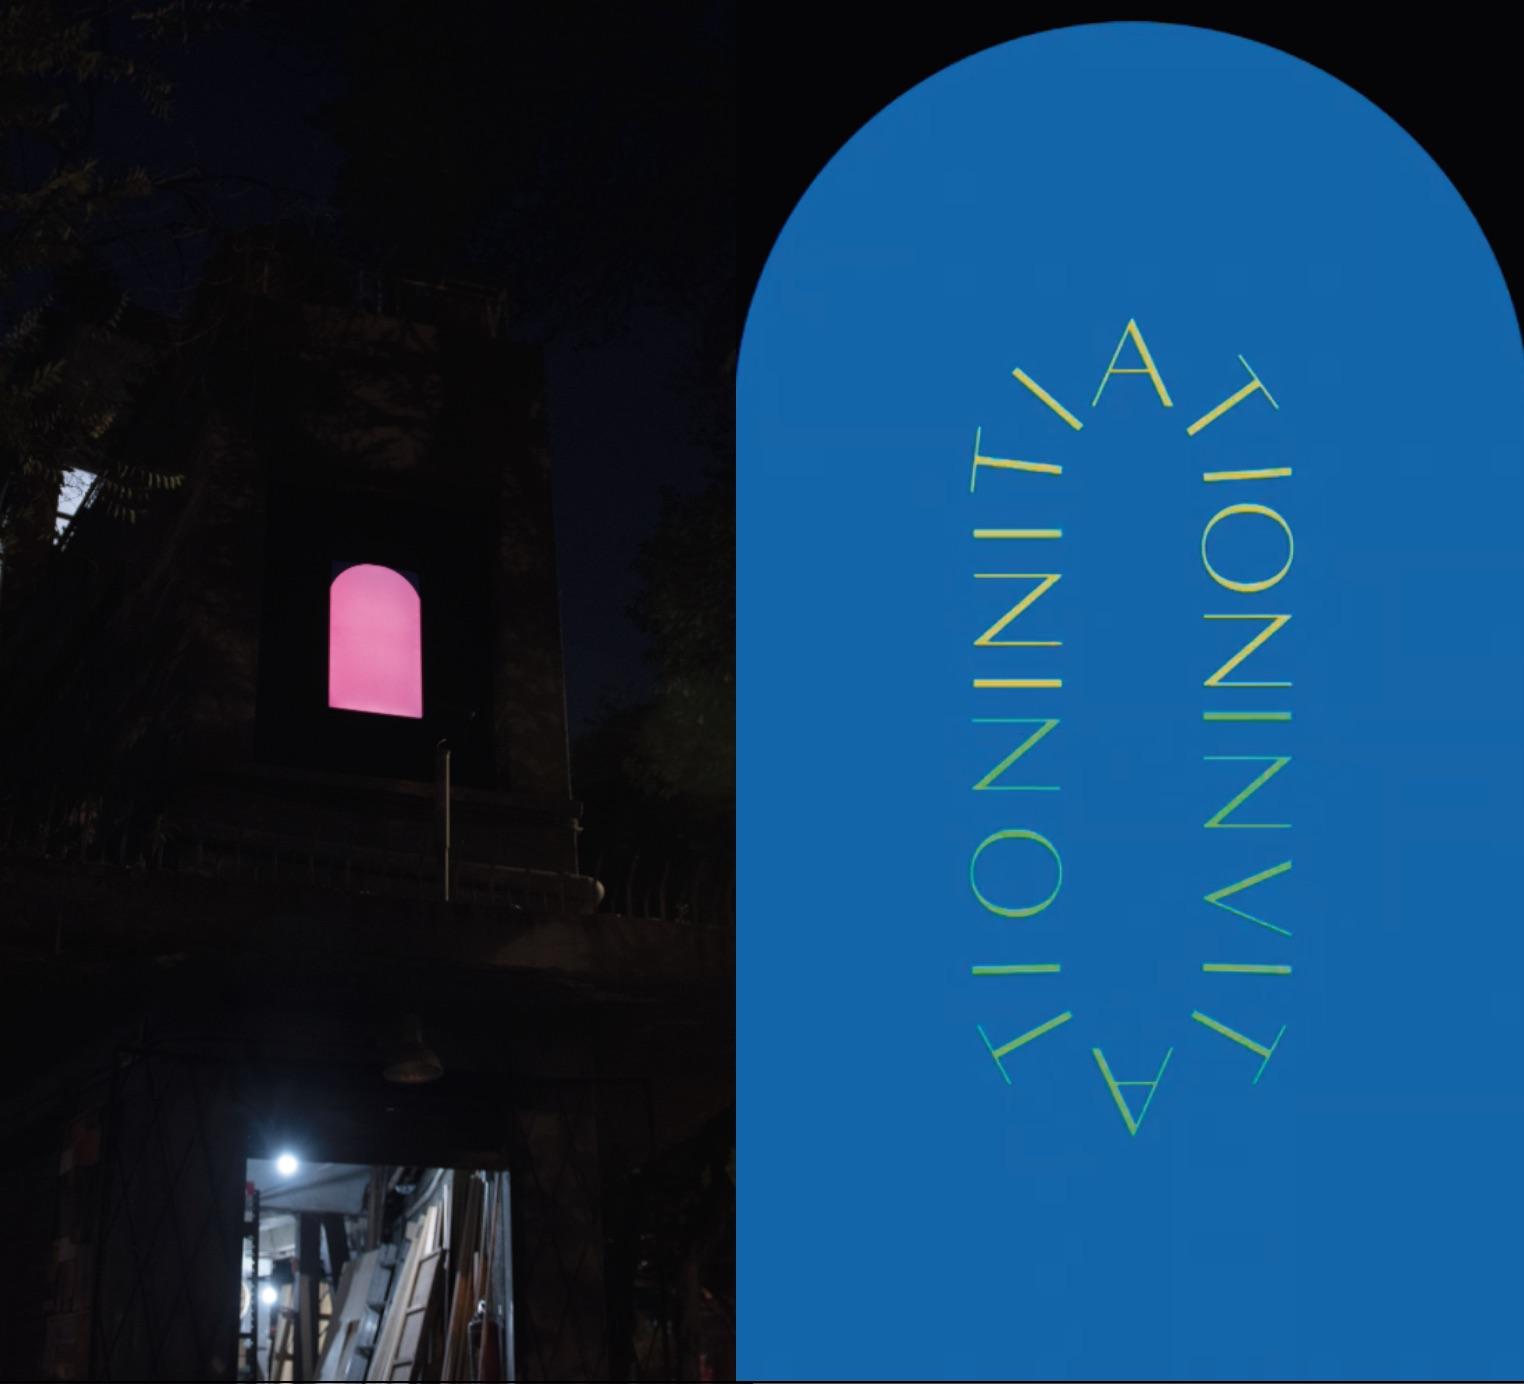 Initiation (Invitation), Ana Montiel, Festival del Silencio, Aparador Cuchilla México, 2020. Foto: Alonso Cedillo